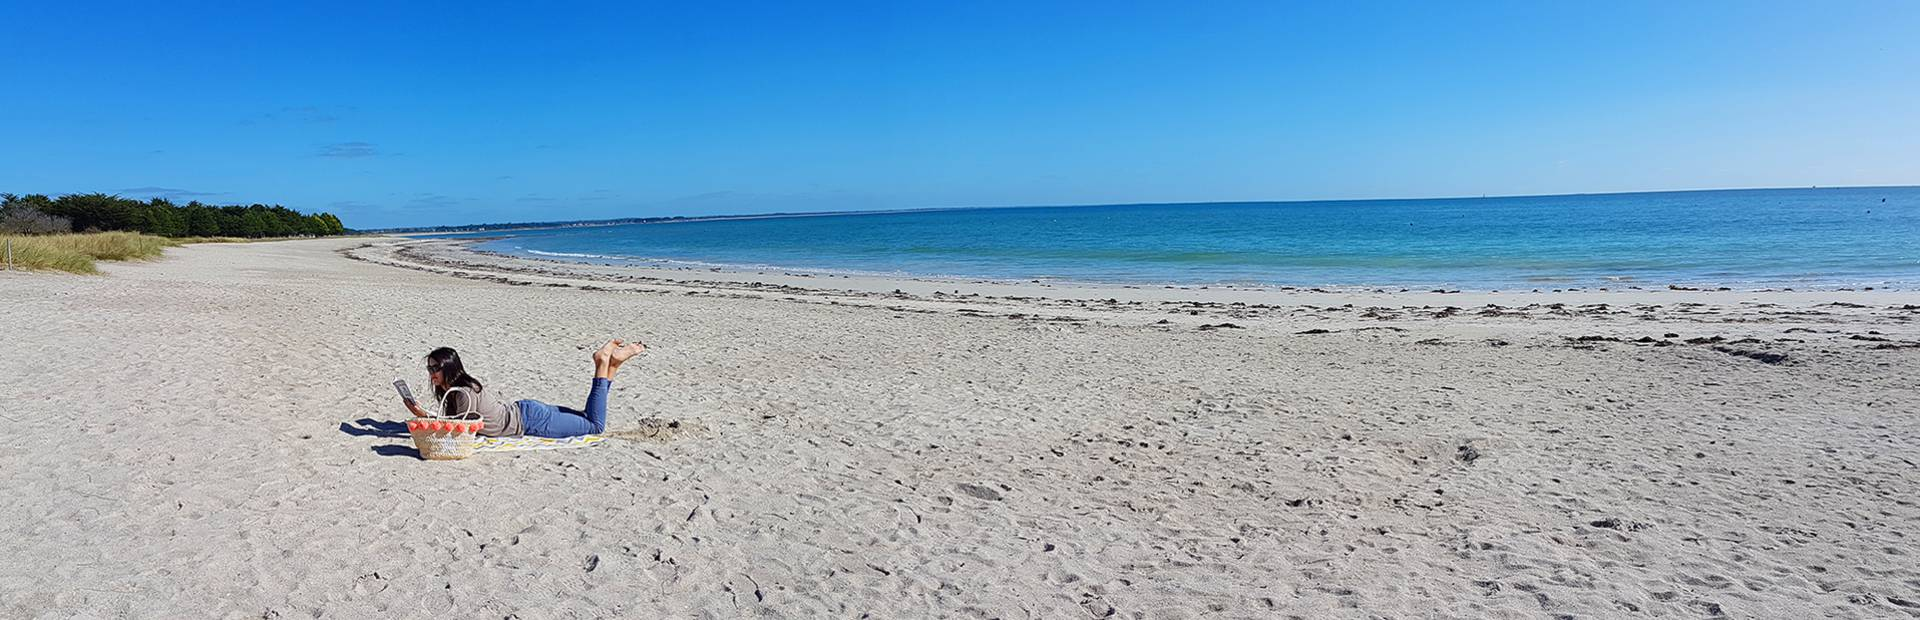 Lazing on the beach at Ile Tudy, Pays Bigouden-® E Cleret